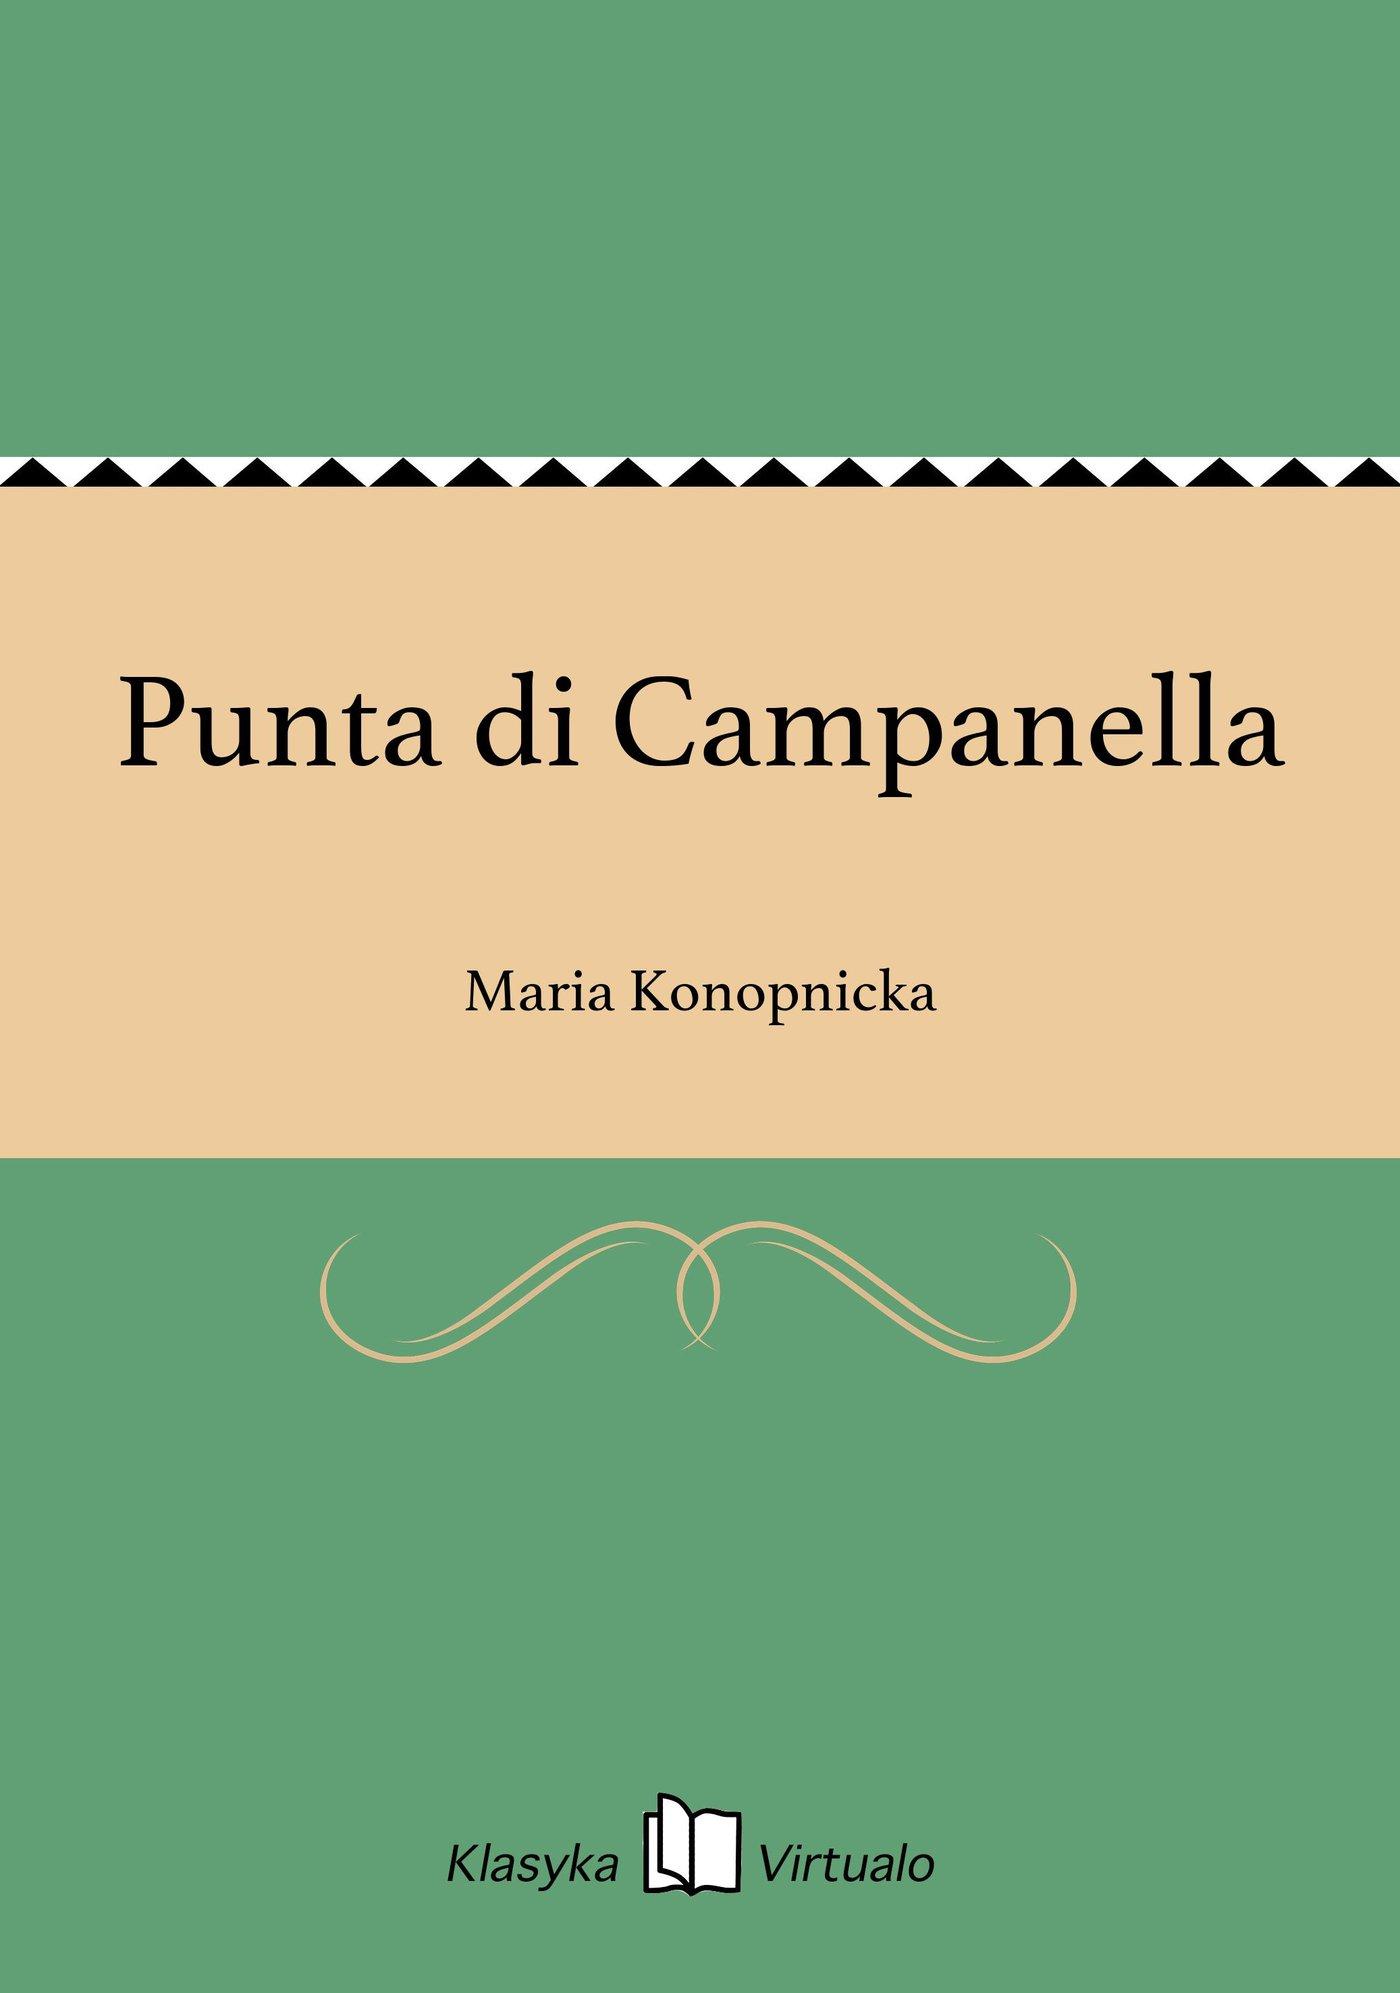 Punta di Campanella - Ebook (Książka EPUB) do pobrania w formacie EPUB